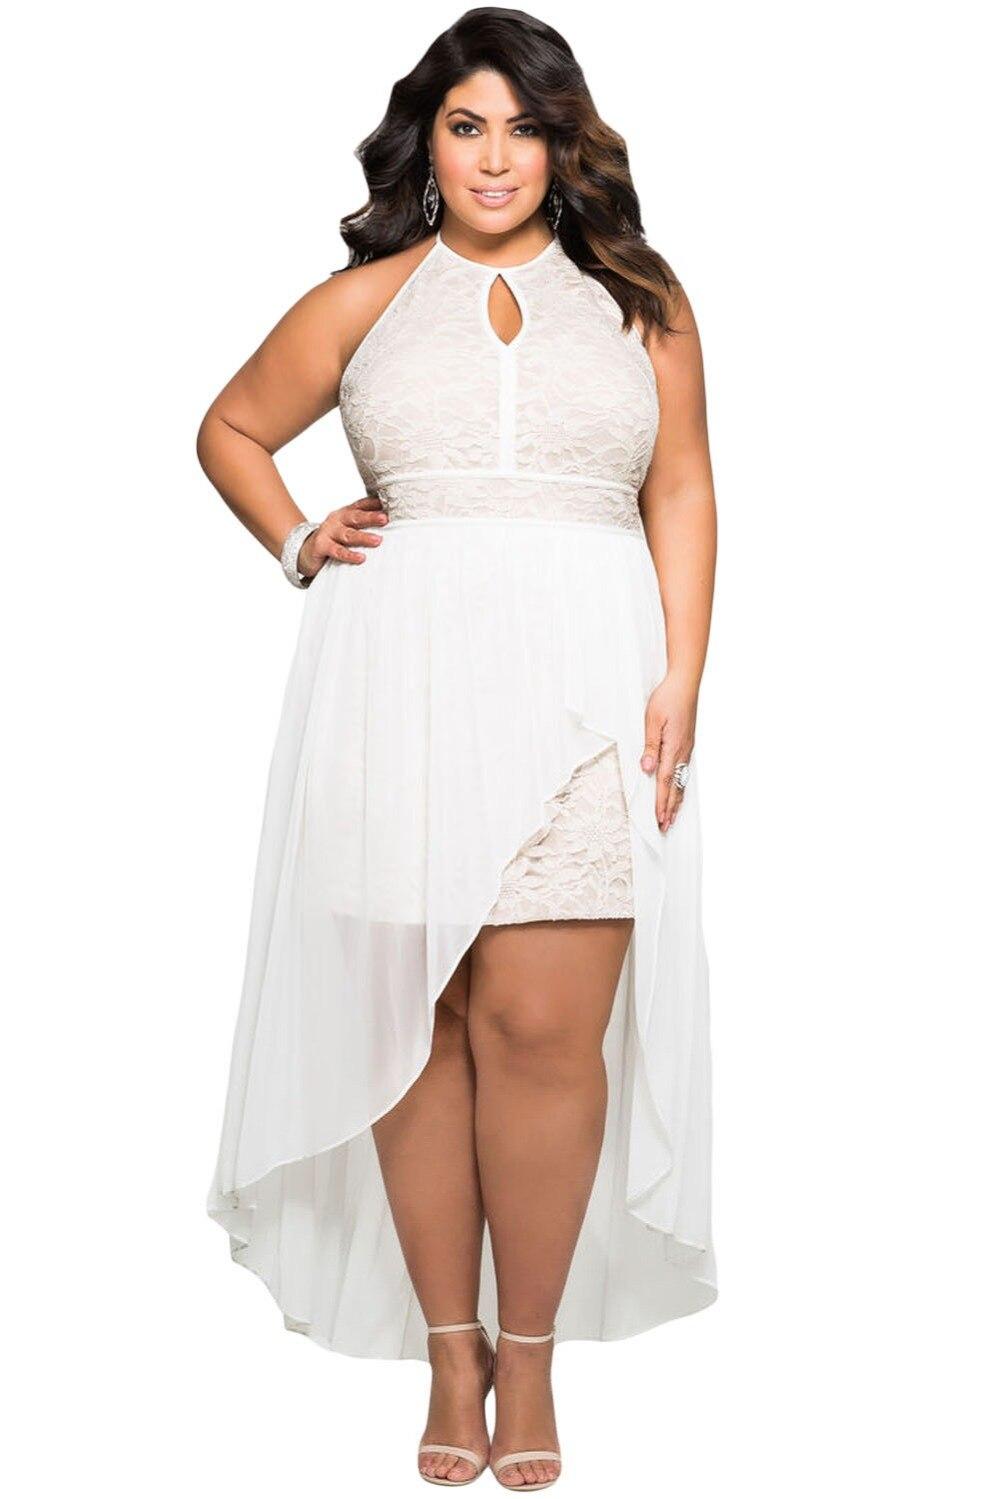 dress - Evening White dresses plus size video